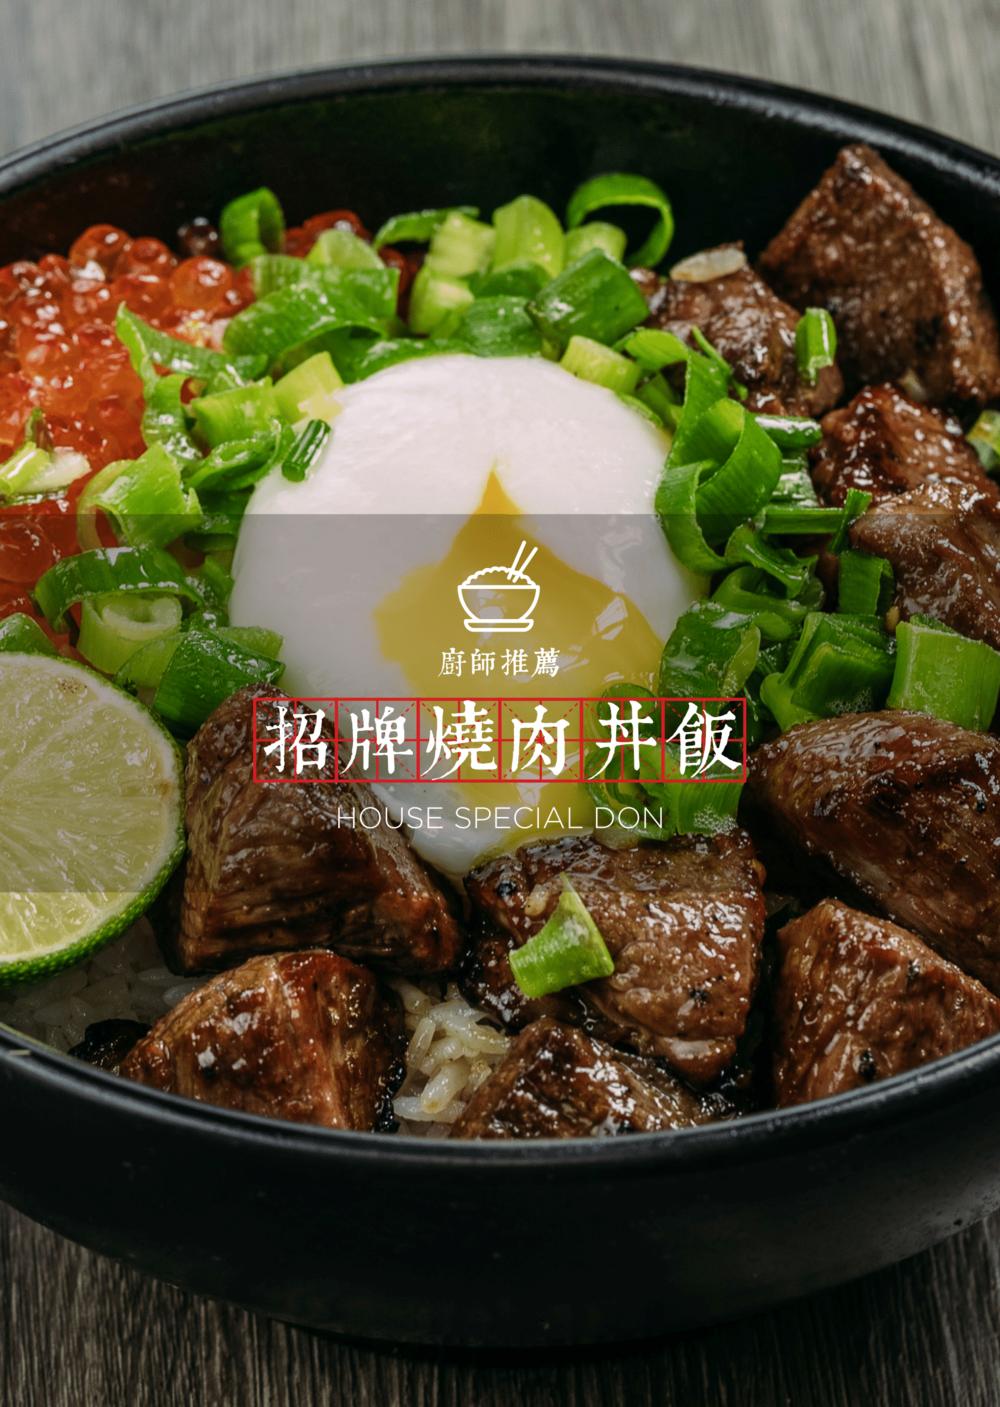 menu2018_小吃饭类-print-17-1.png